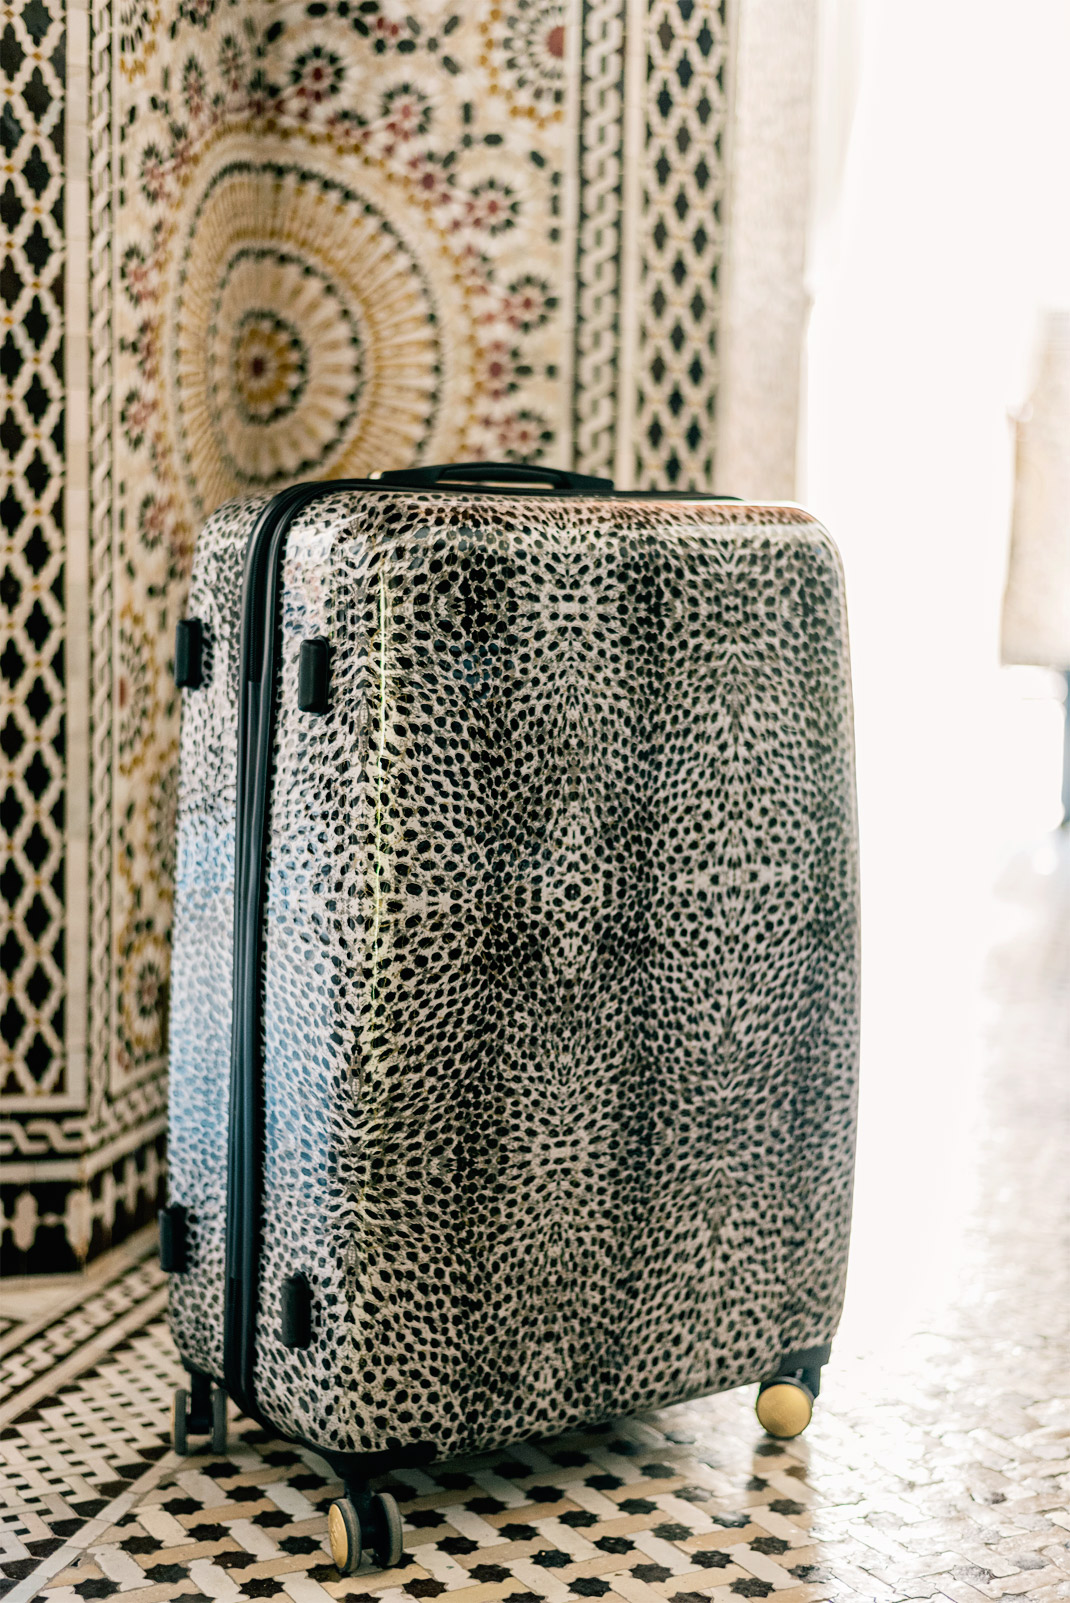 biba-amure-animal-print-suitcase